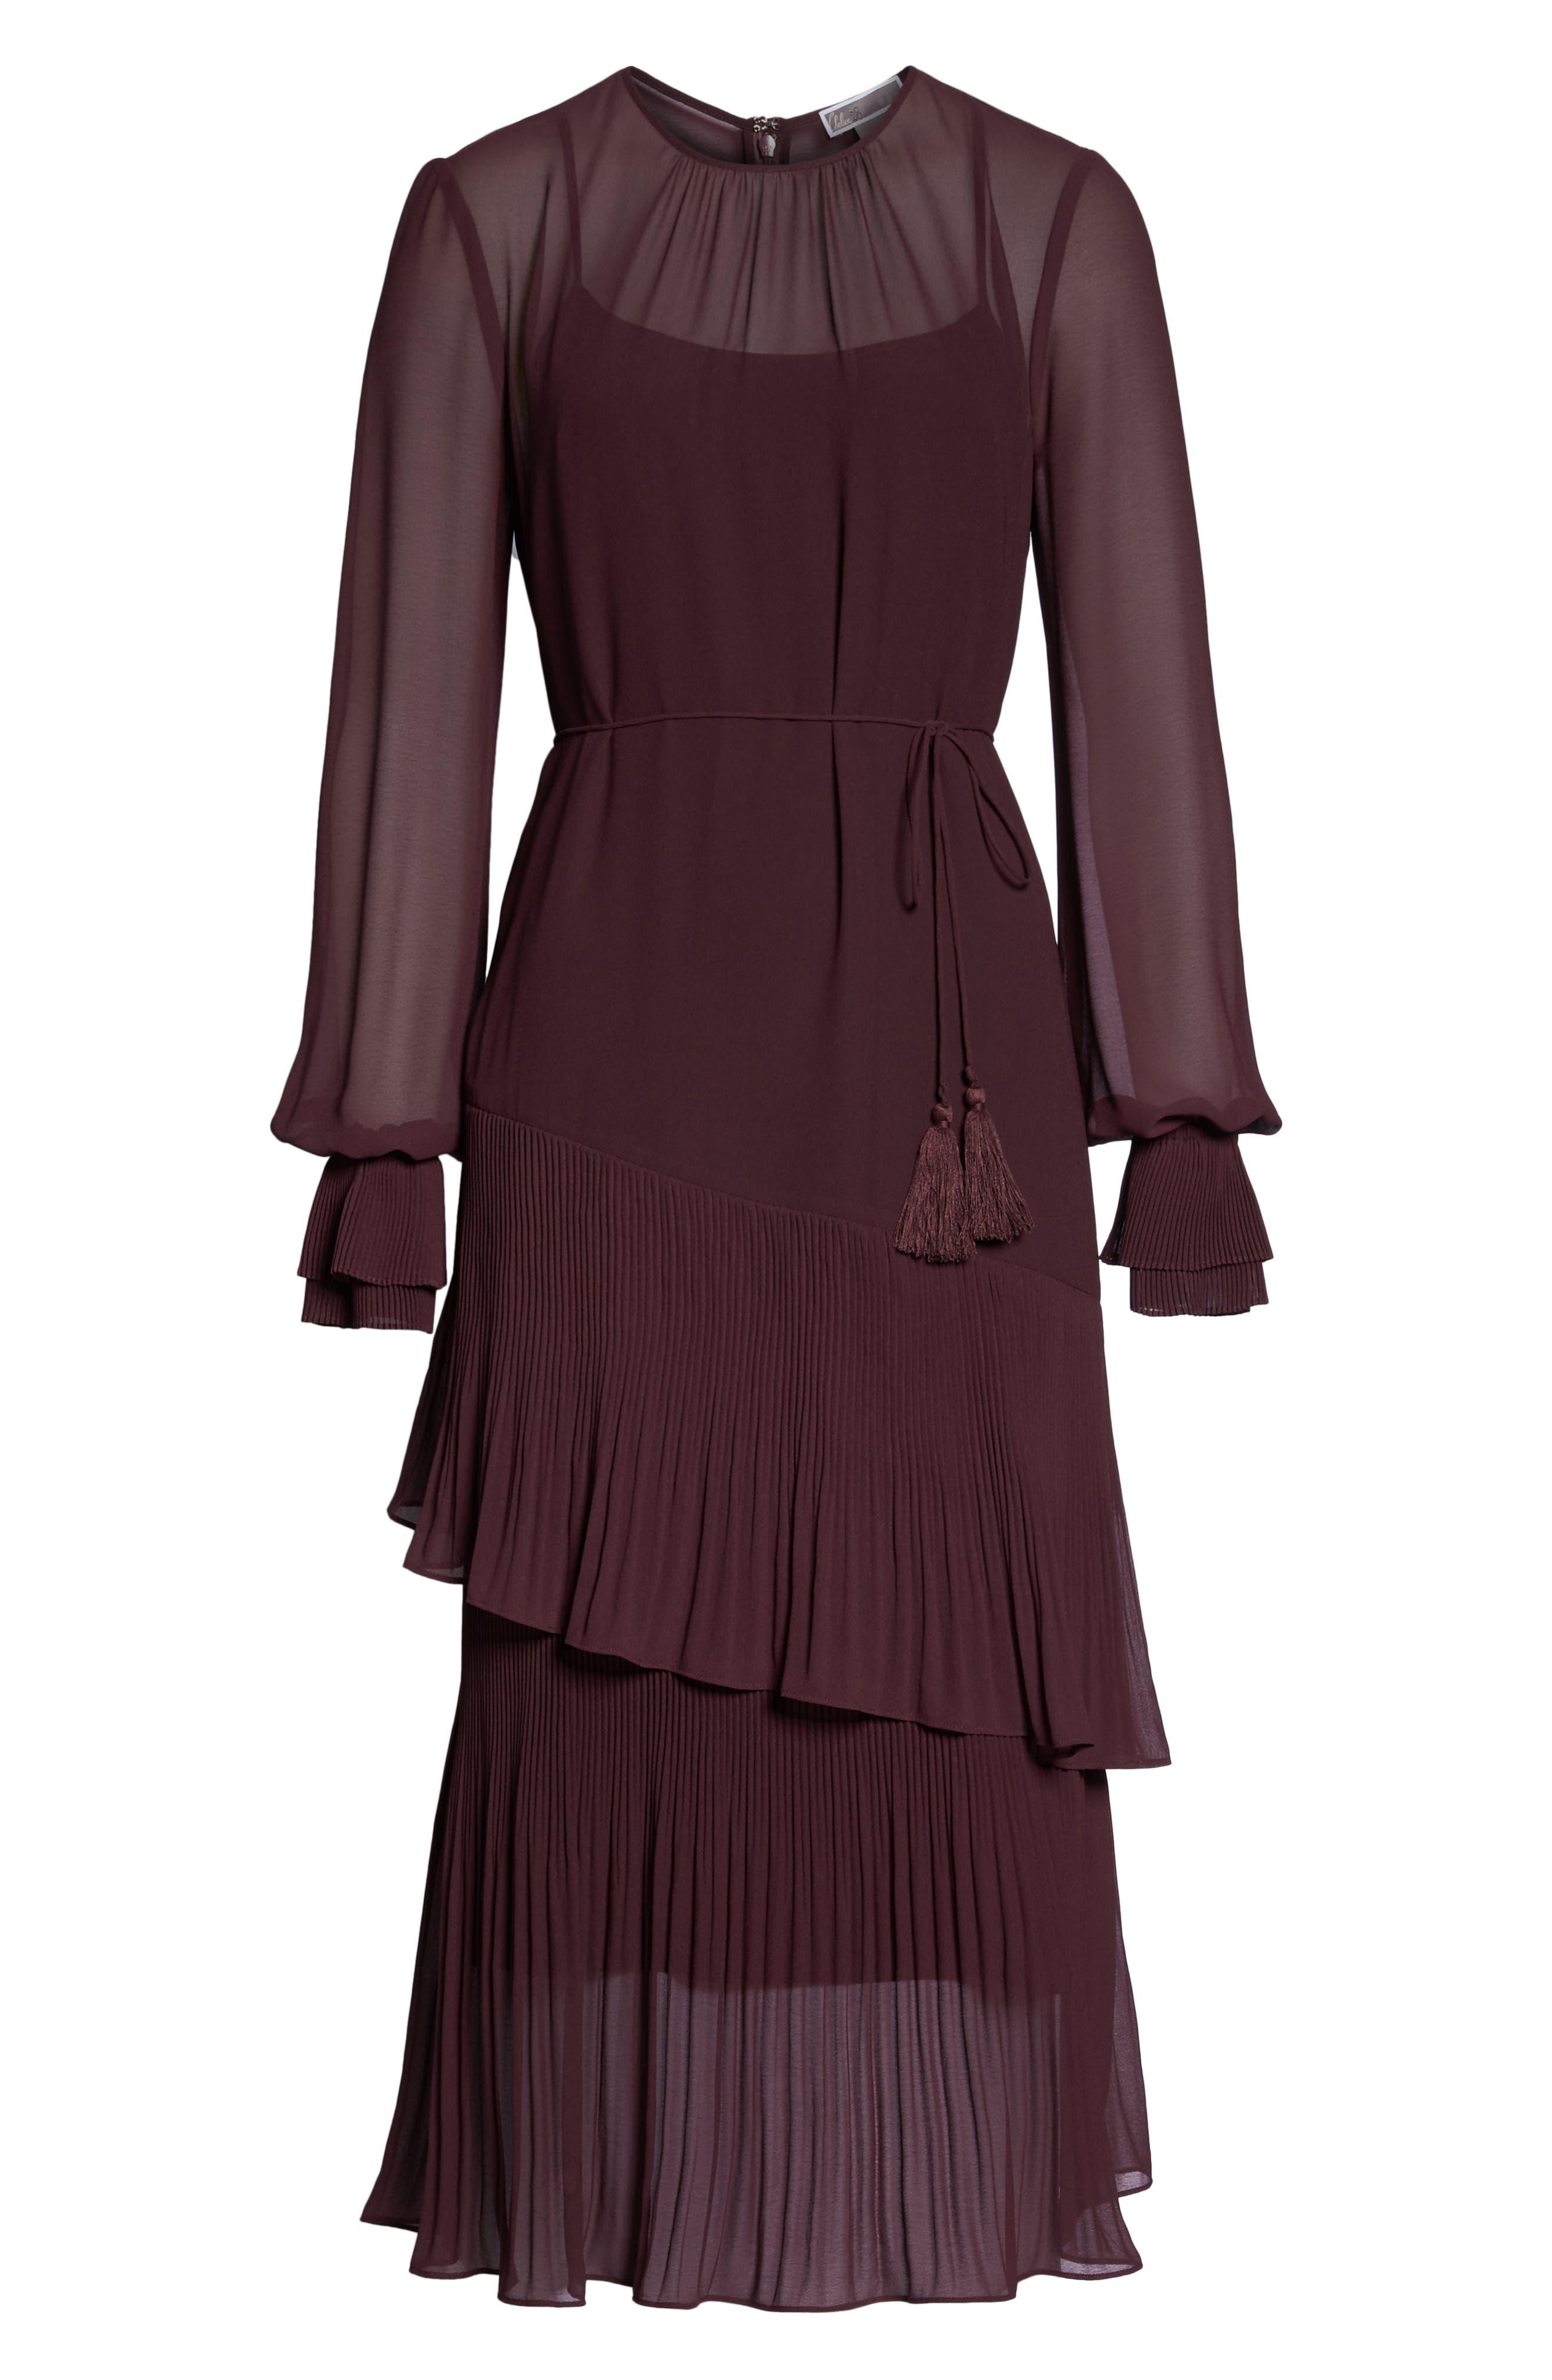 Pleat Detail Midi Dress,                             Alternate thumbnail 6, color,                             BURGUNDY STEM